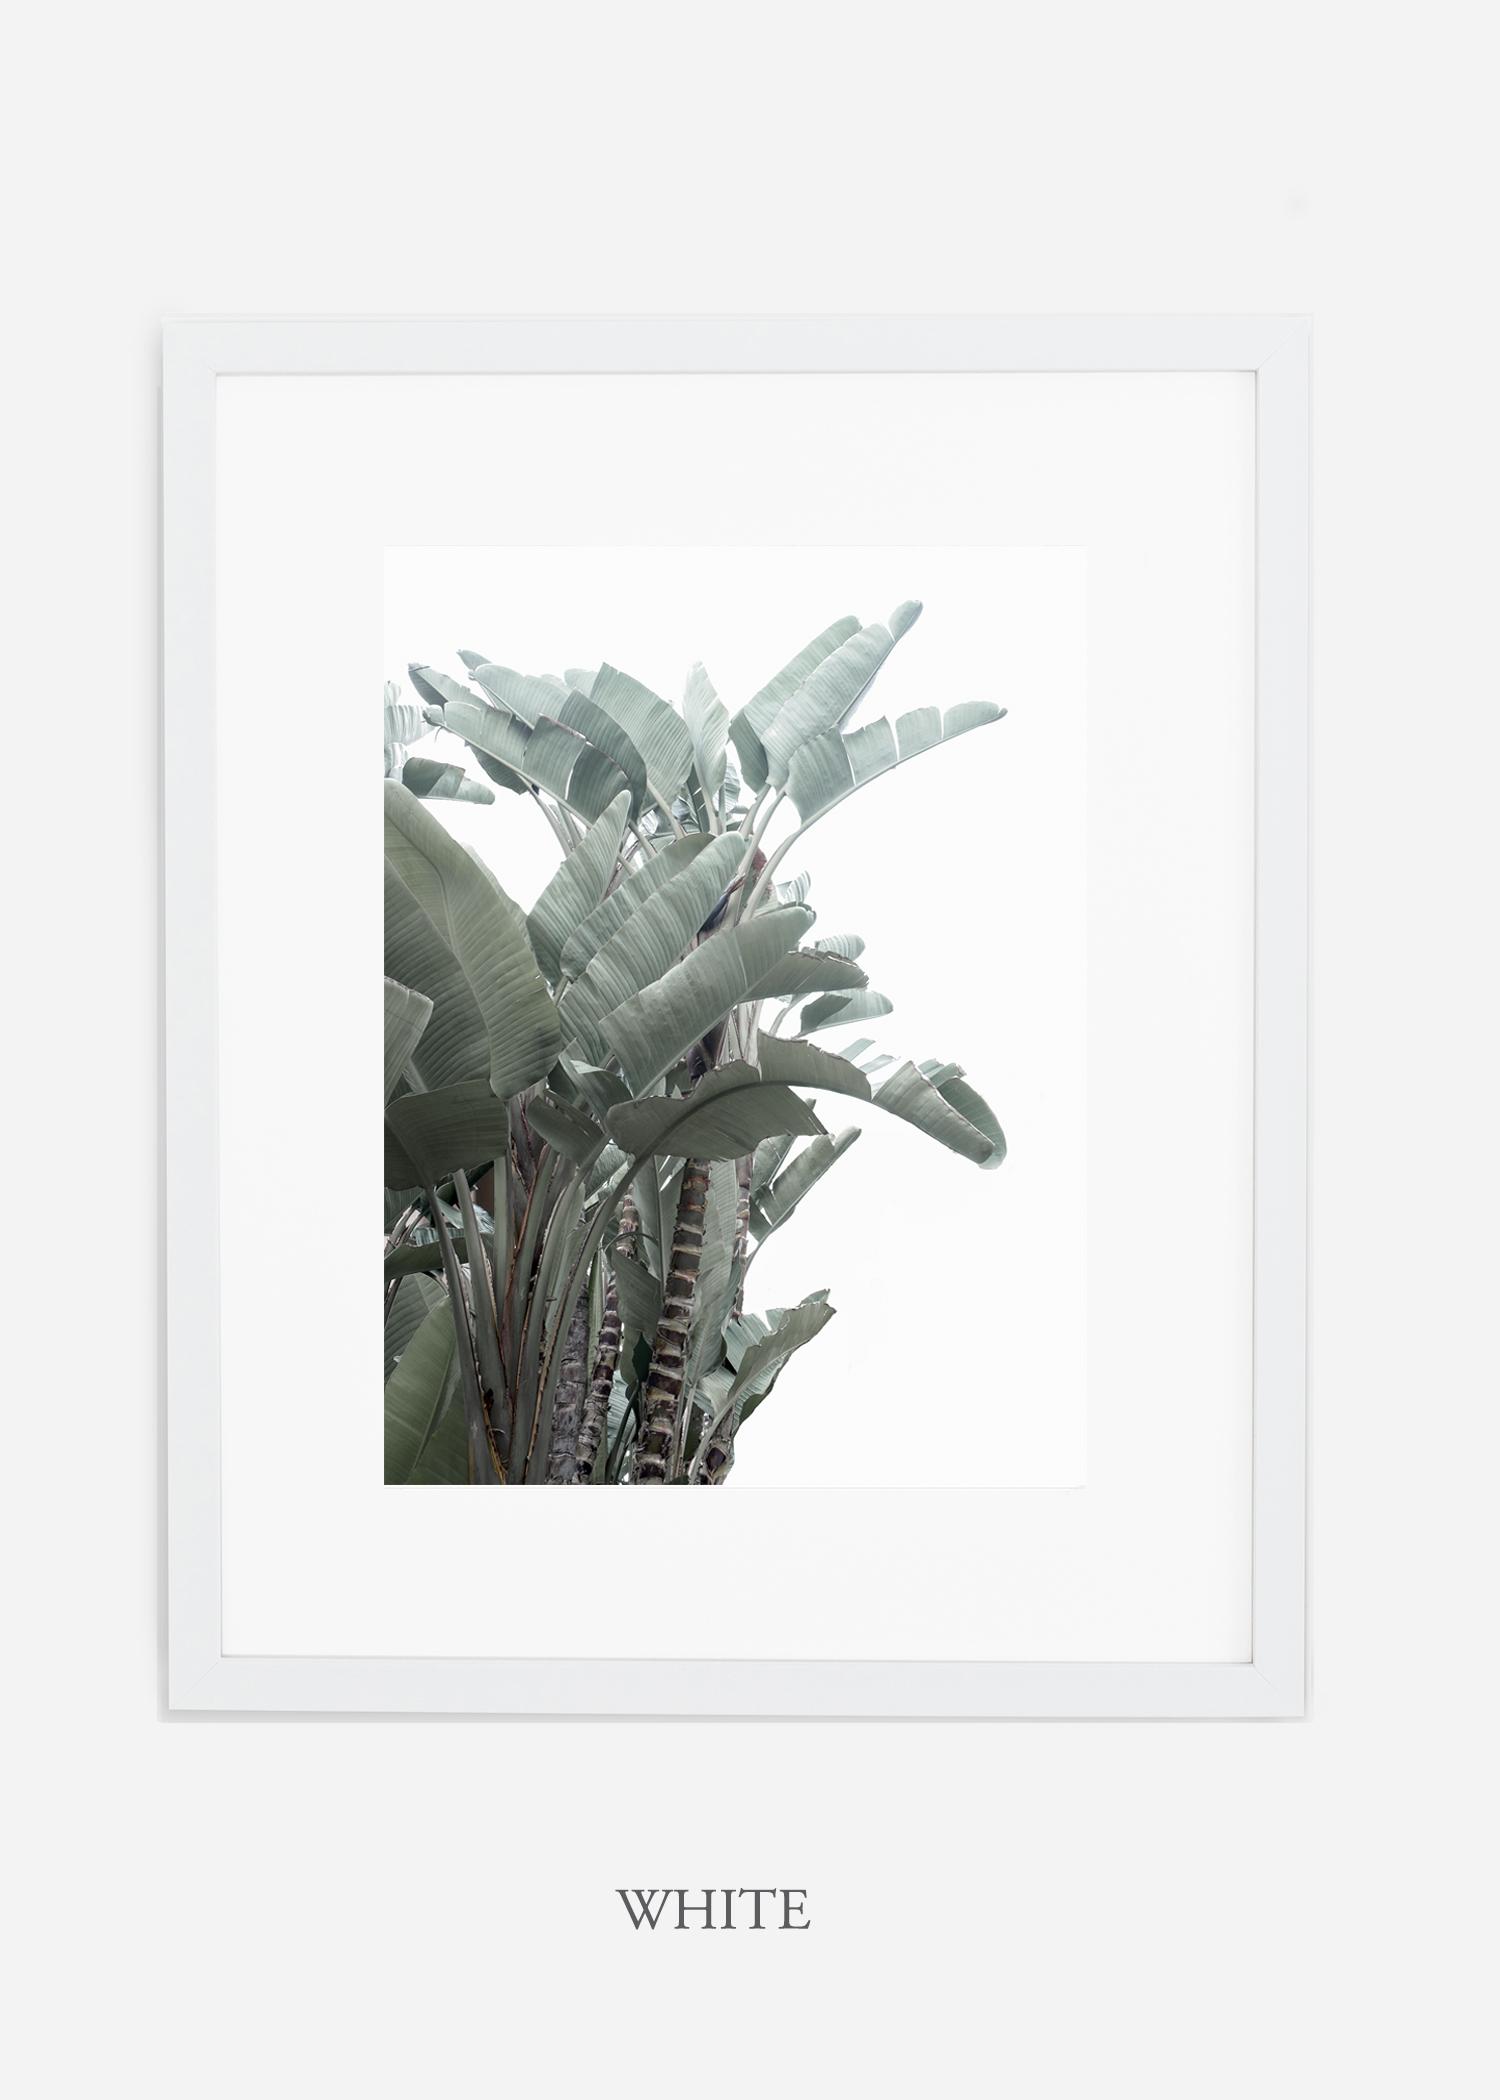 wildercalifornia_whiteframe_WinterWhite_BananaLeafNo.1_Tropical_LosAngeles_Art_HomeDecor_interiordesign_design.jpg